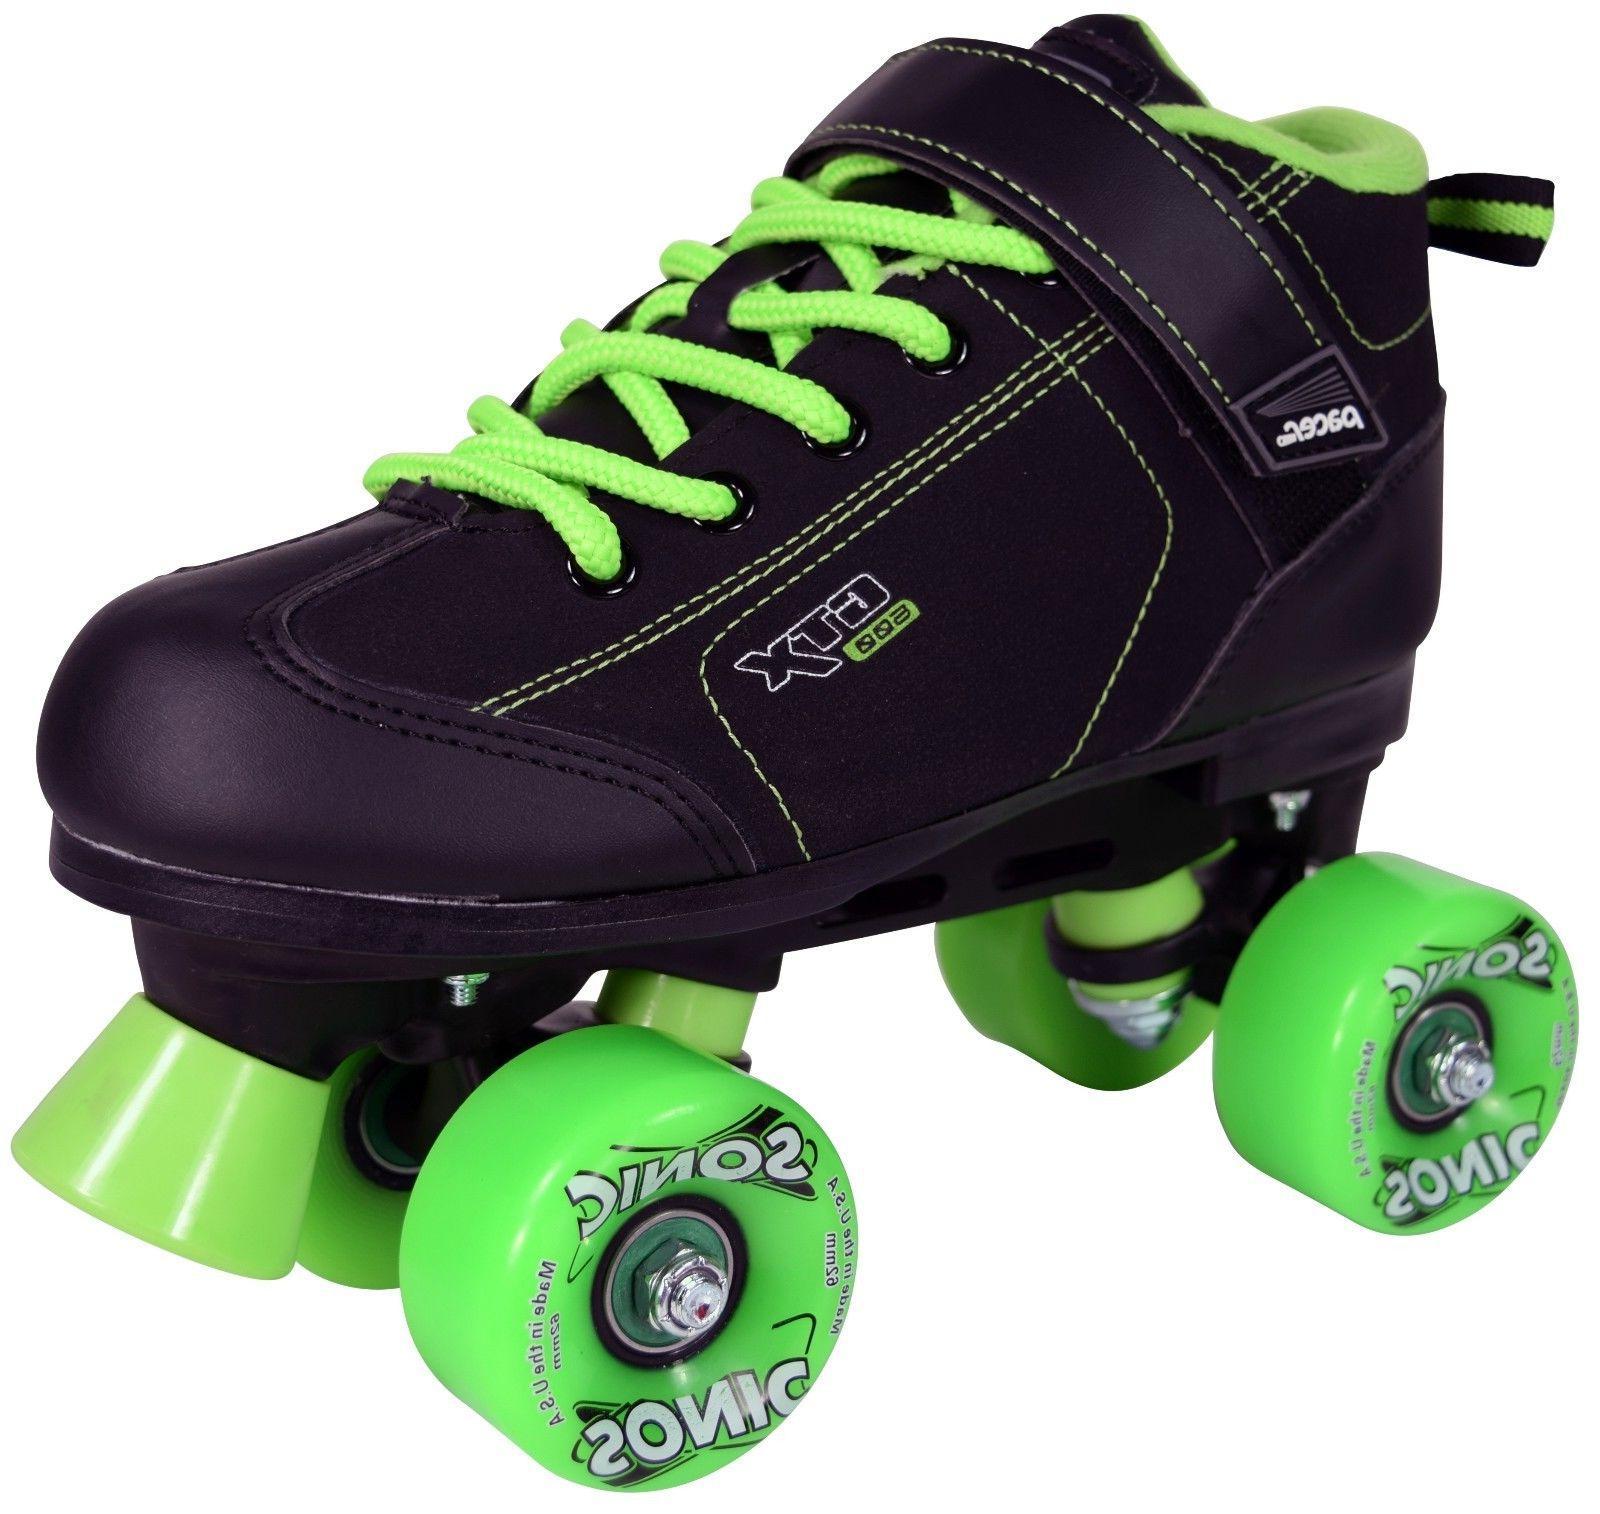 black and neon green gtx 500 sonic